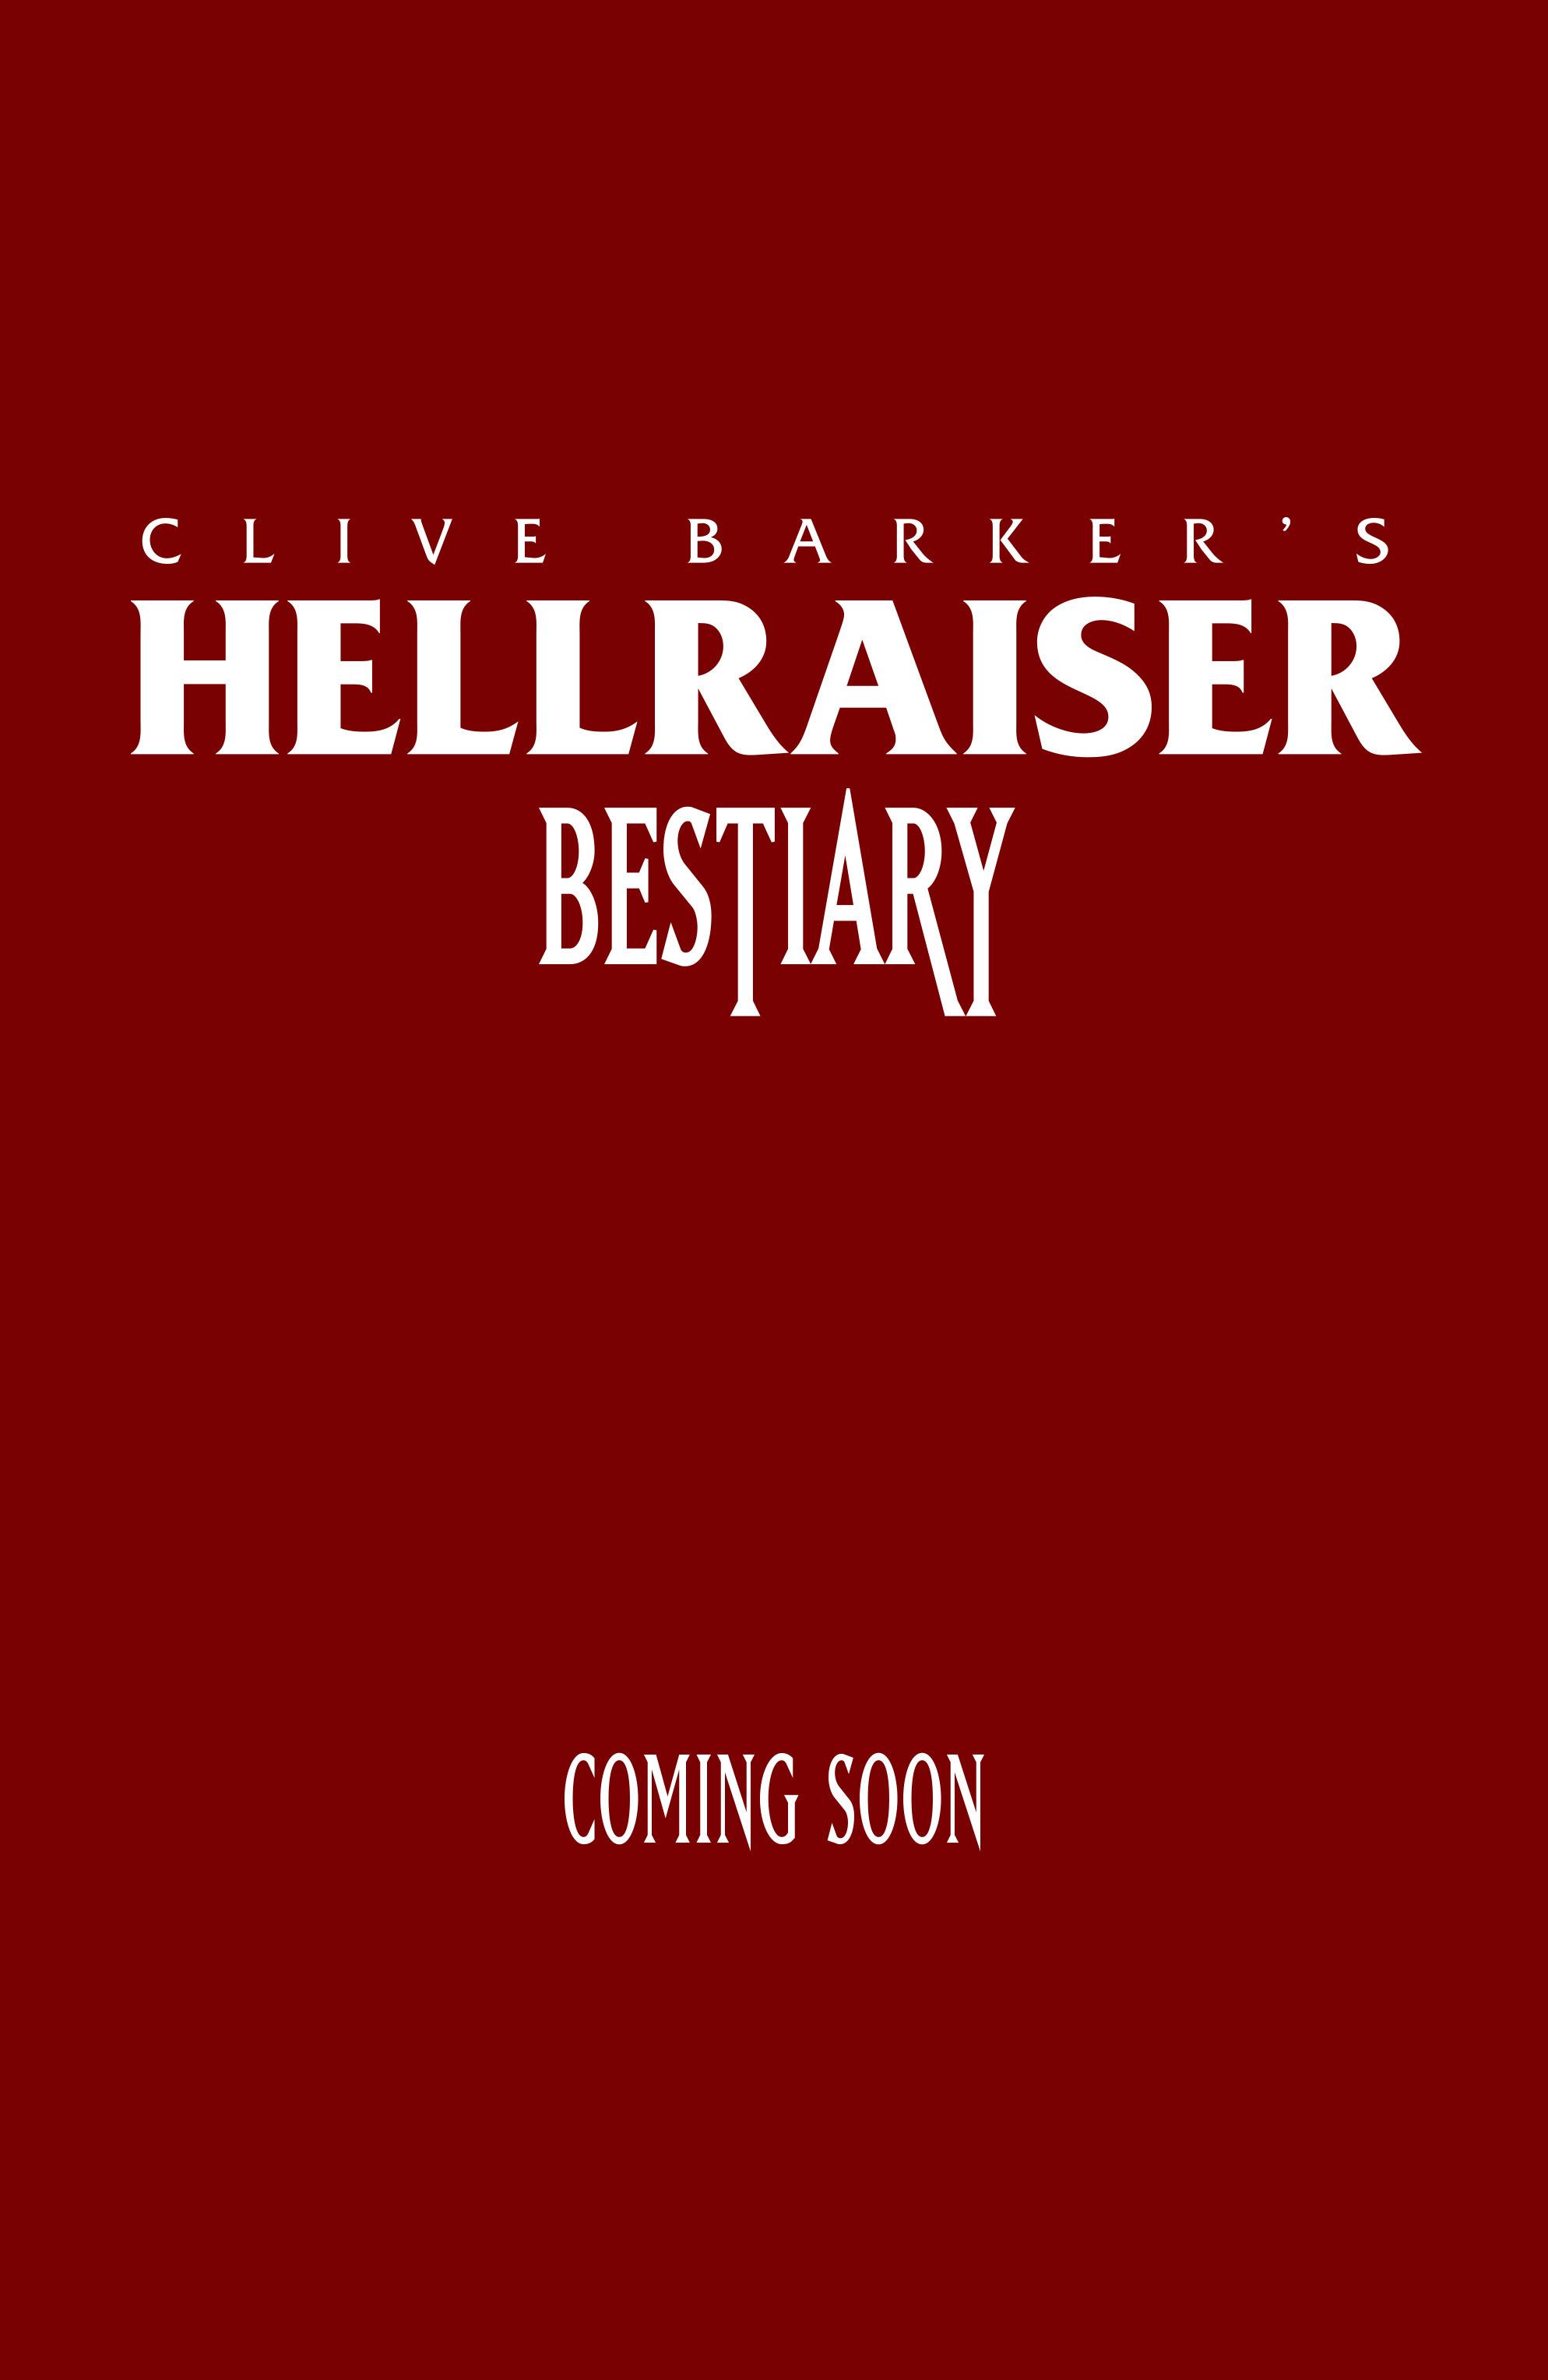 Read online Clive Barker's Hellraiser: The Dark Watch comic -  Issue # TPB 3 - 135